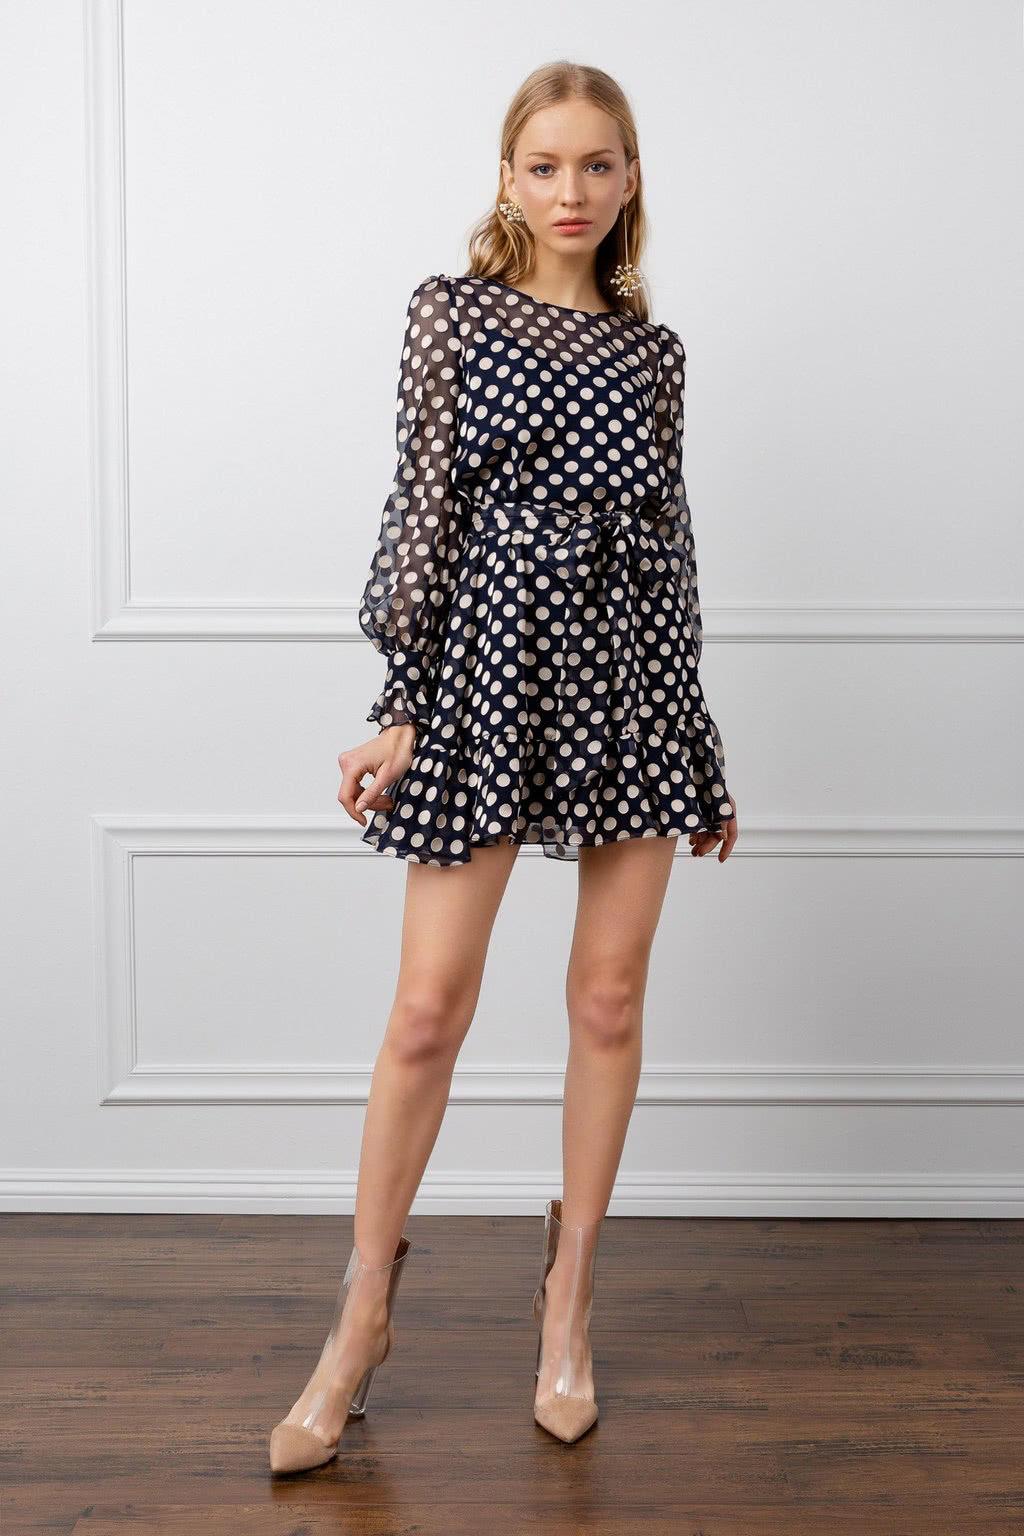 J.ING queenie dress summer 2019 women - Luxe Digital